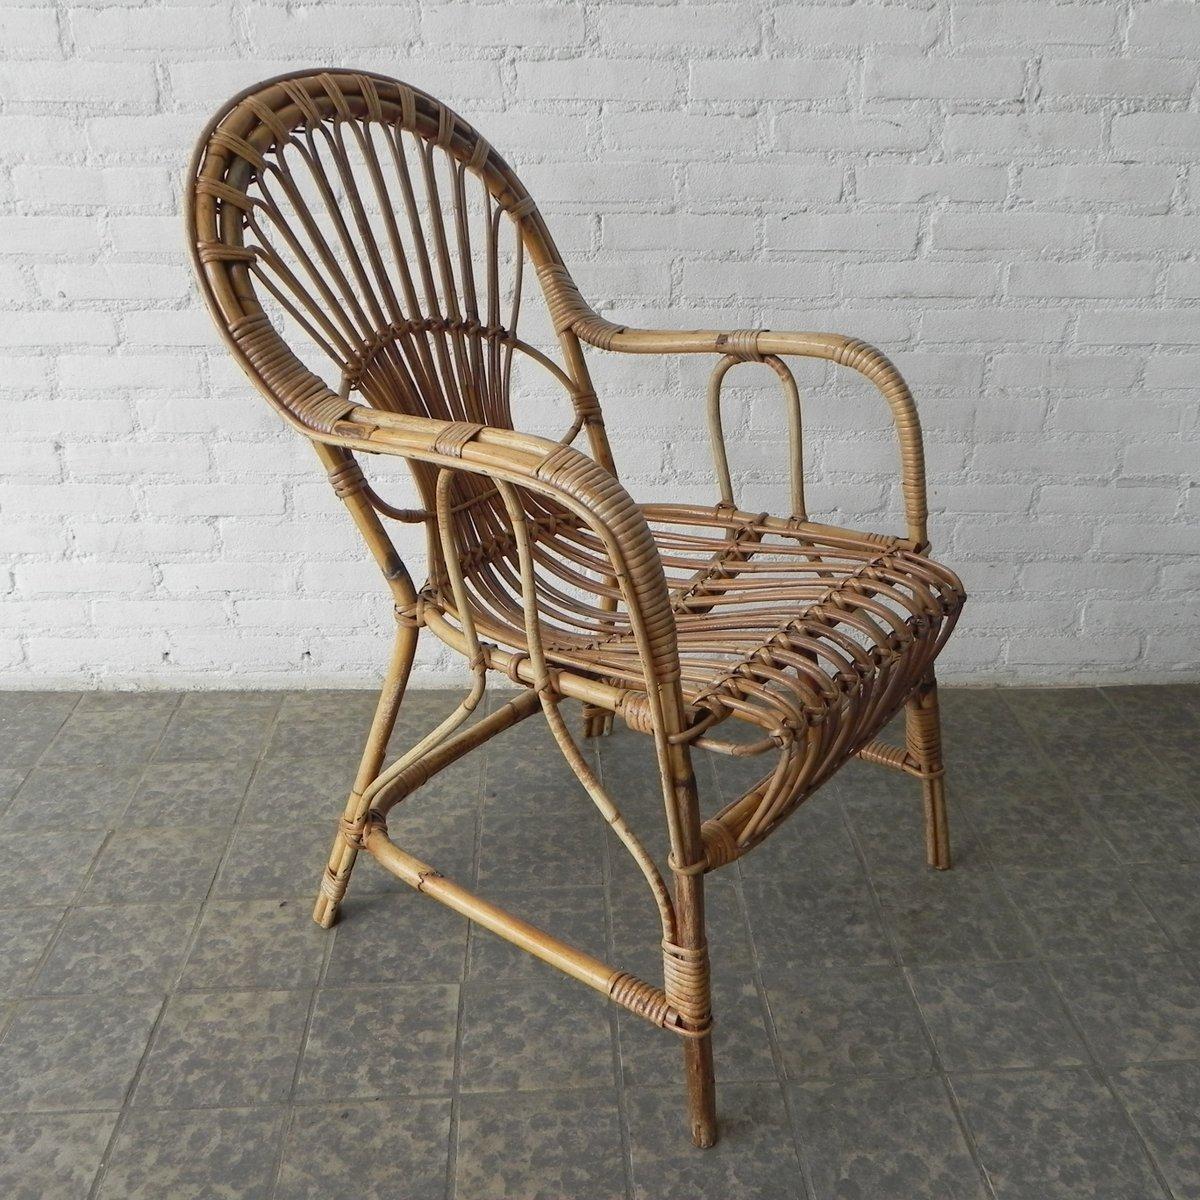 Vintage rattan rocking chair - Vintage Rattan Bamboo Armchair